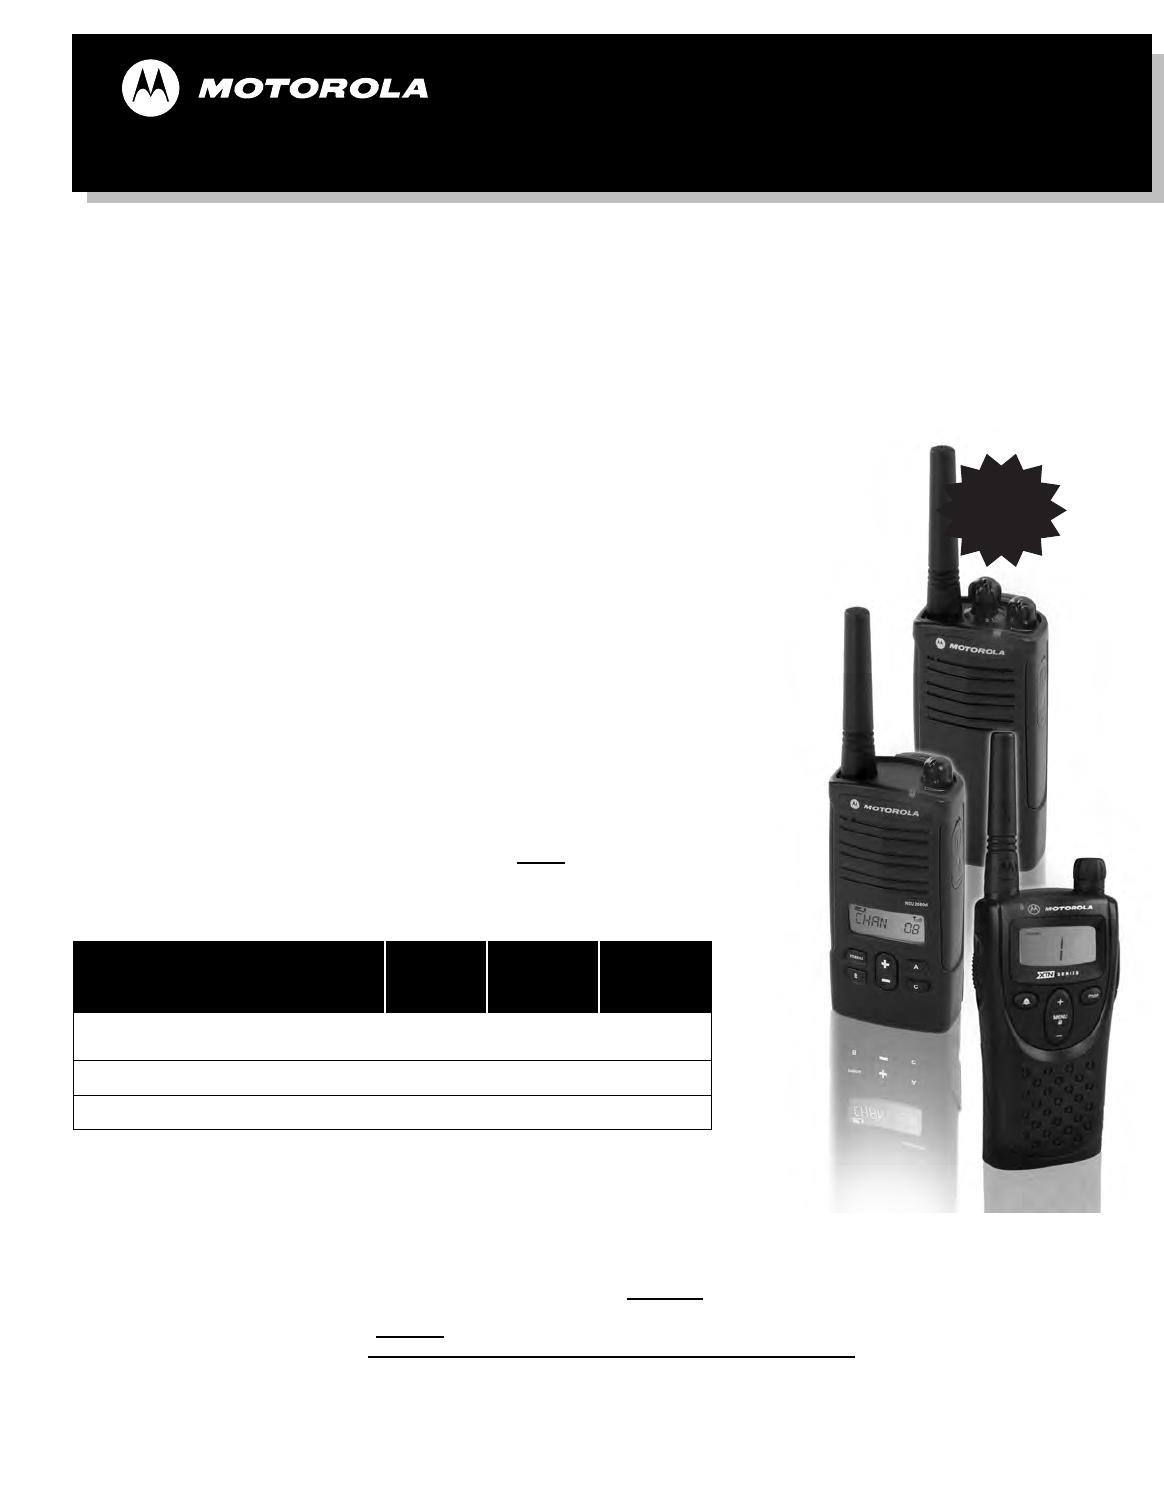 motorola rdx series uhf two way radio rdu4160d users manual rh usermanual wiki